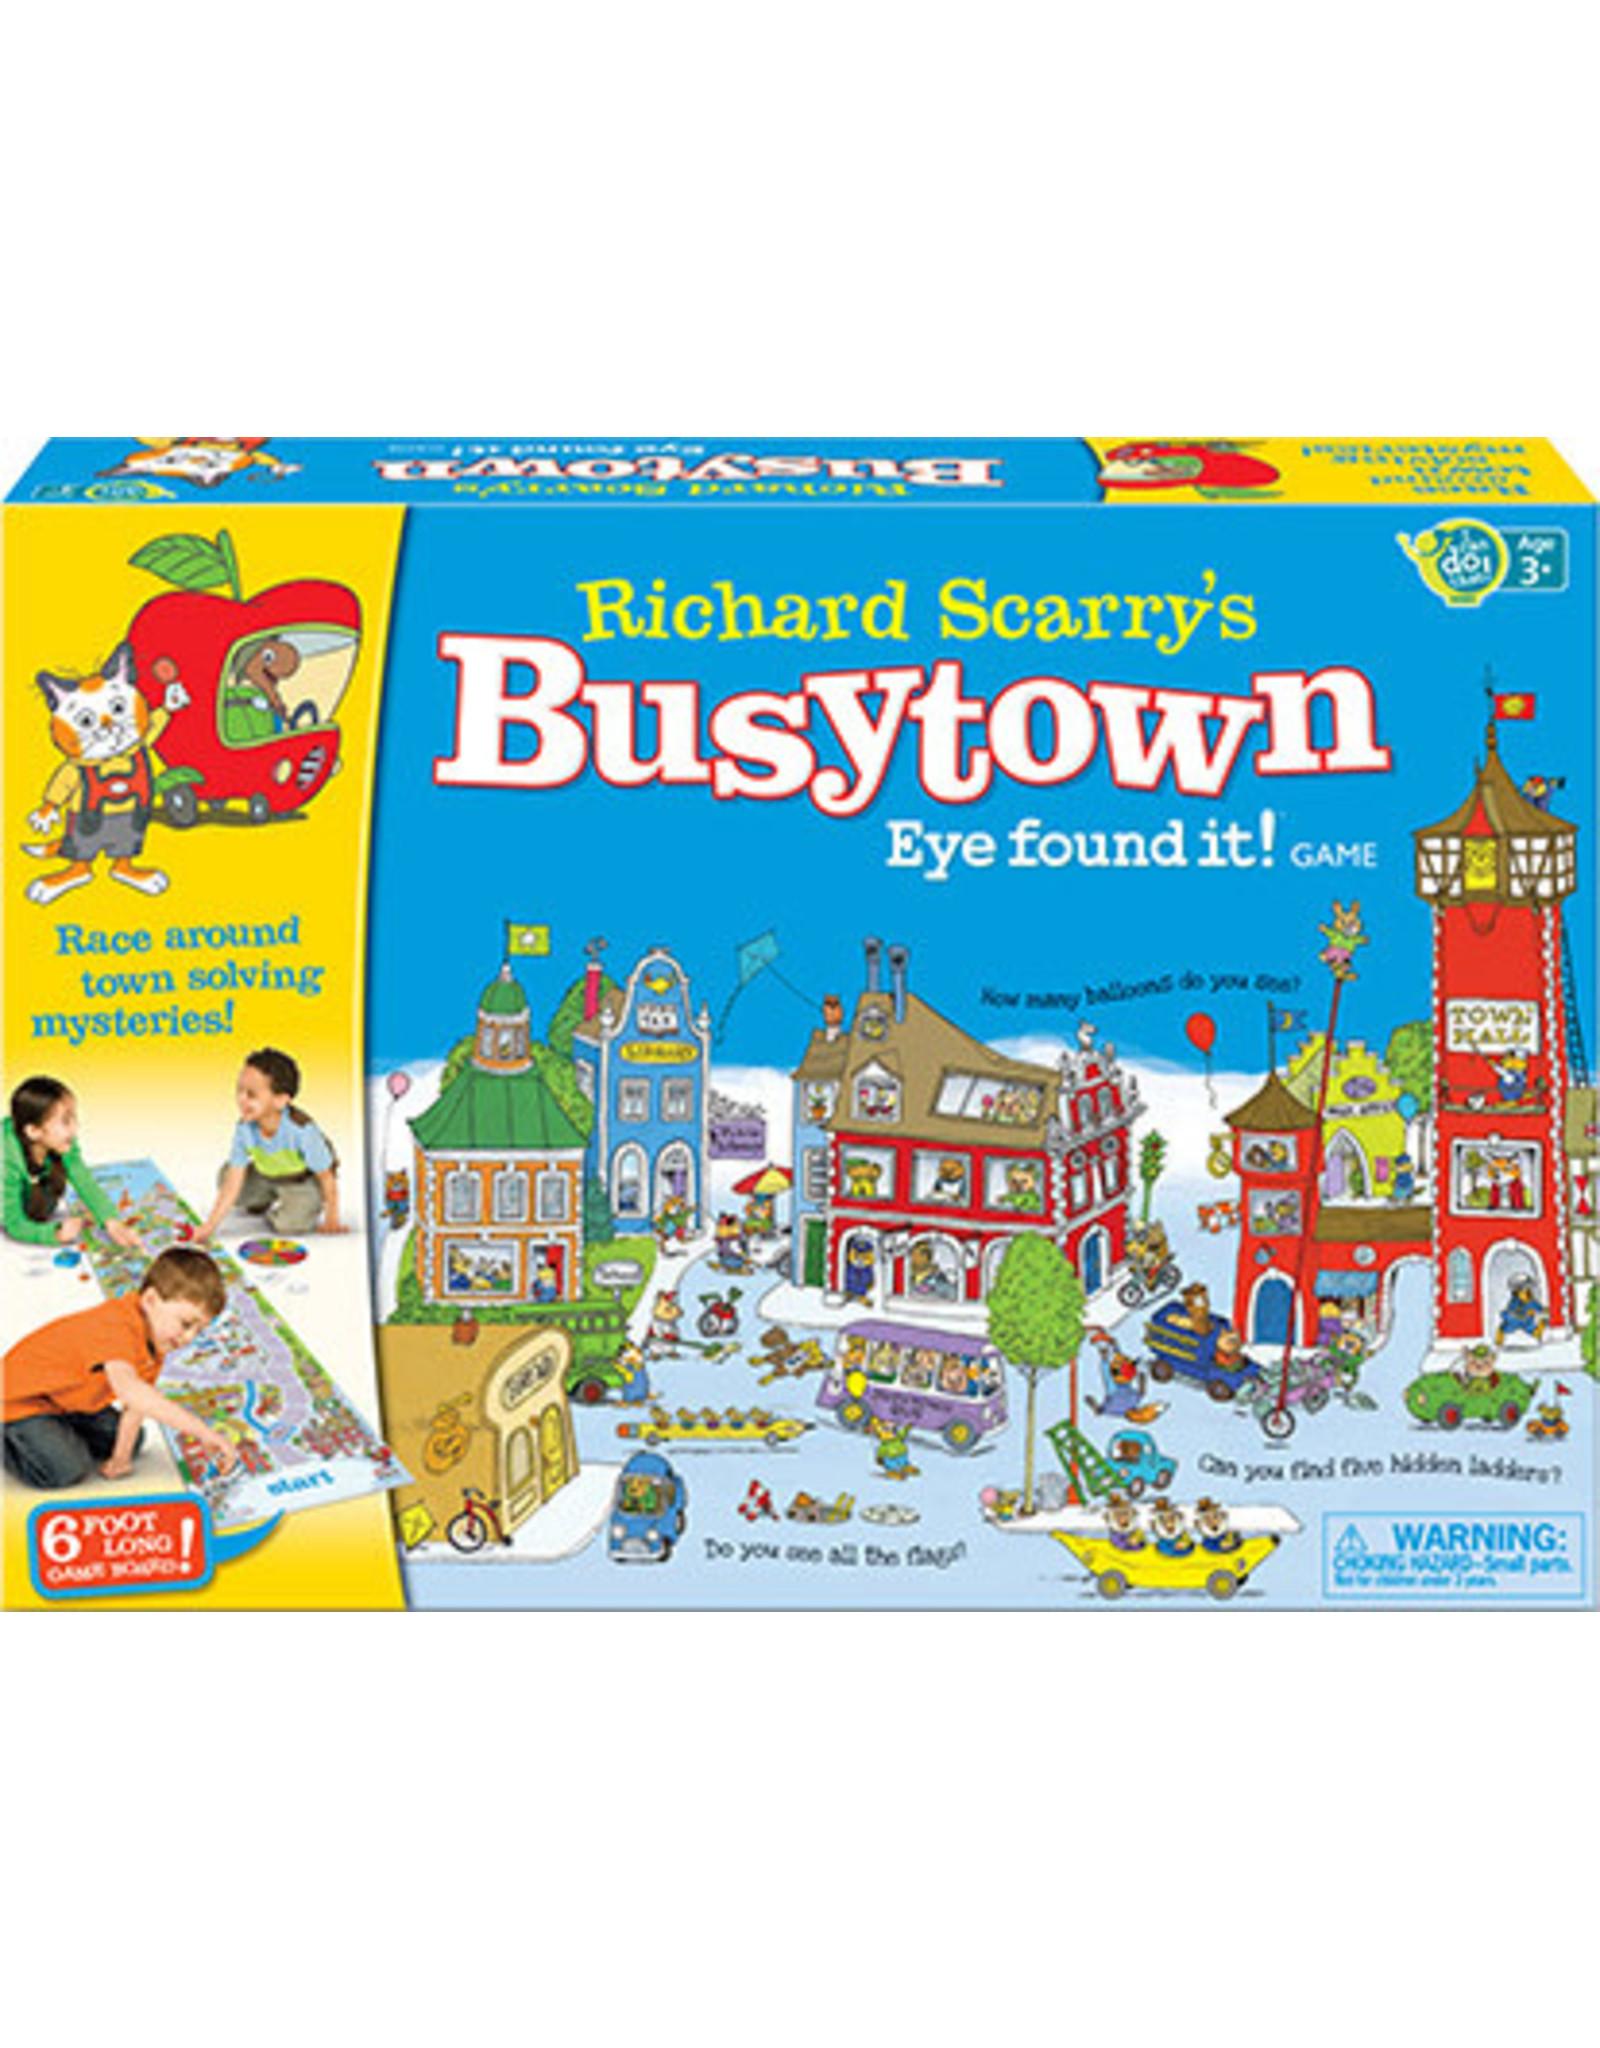 Wonderforge Richard Scarry's Busytown Eye Found It Game